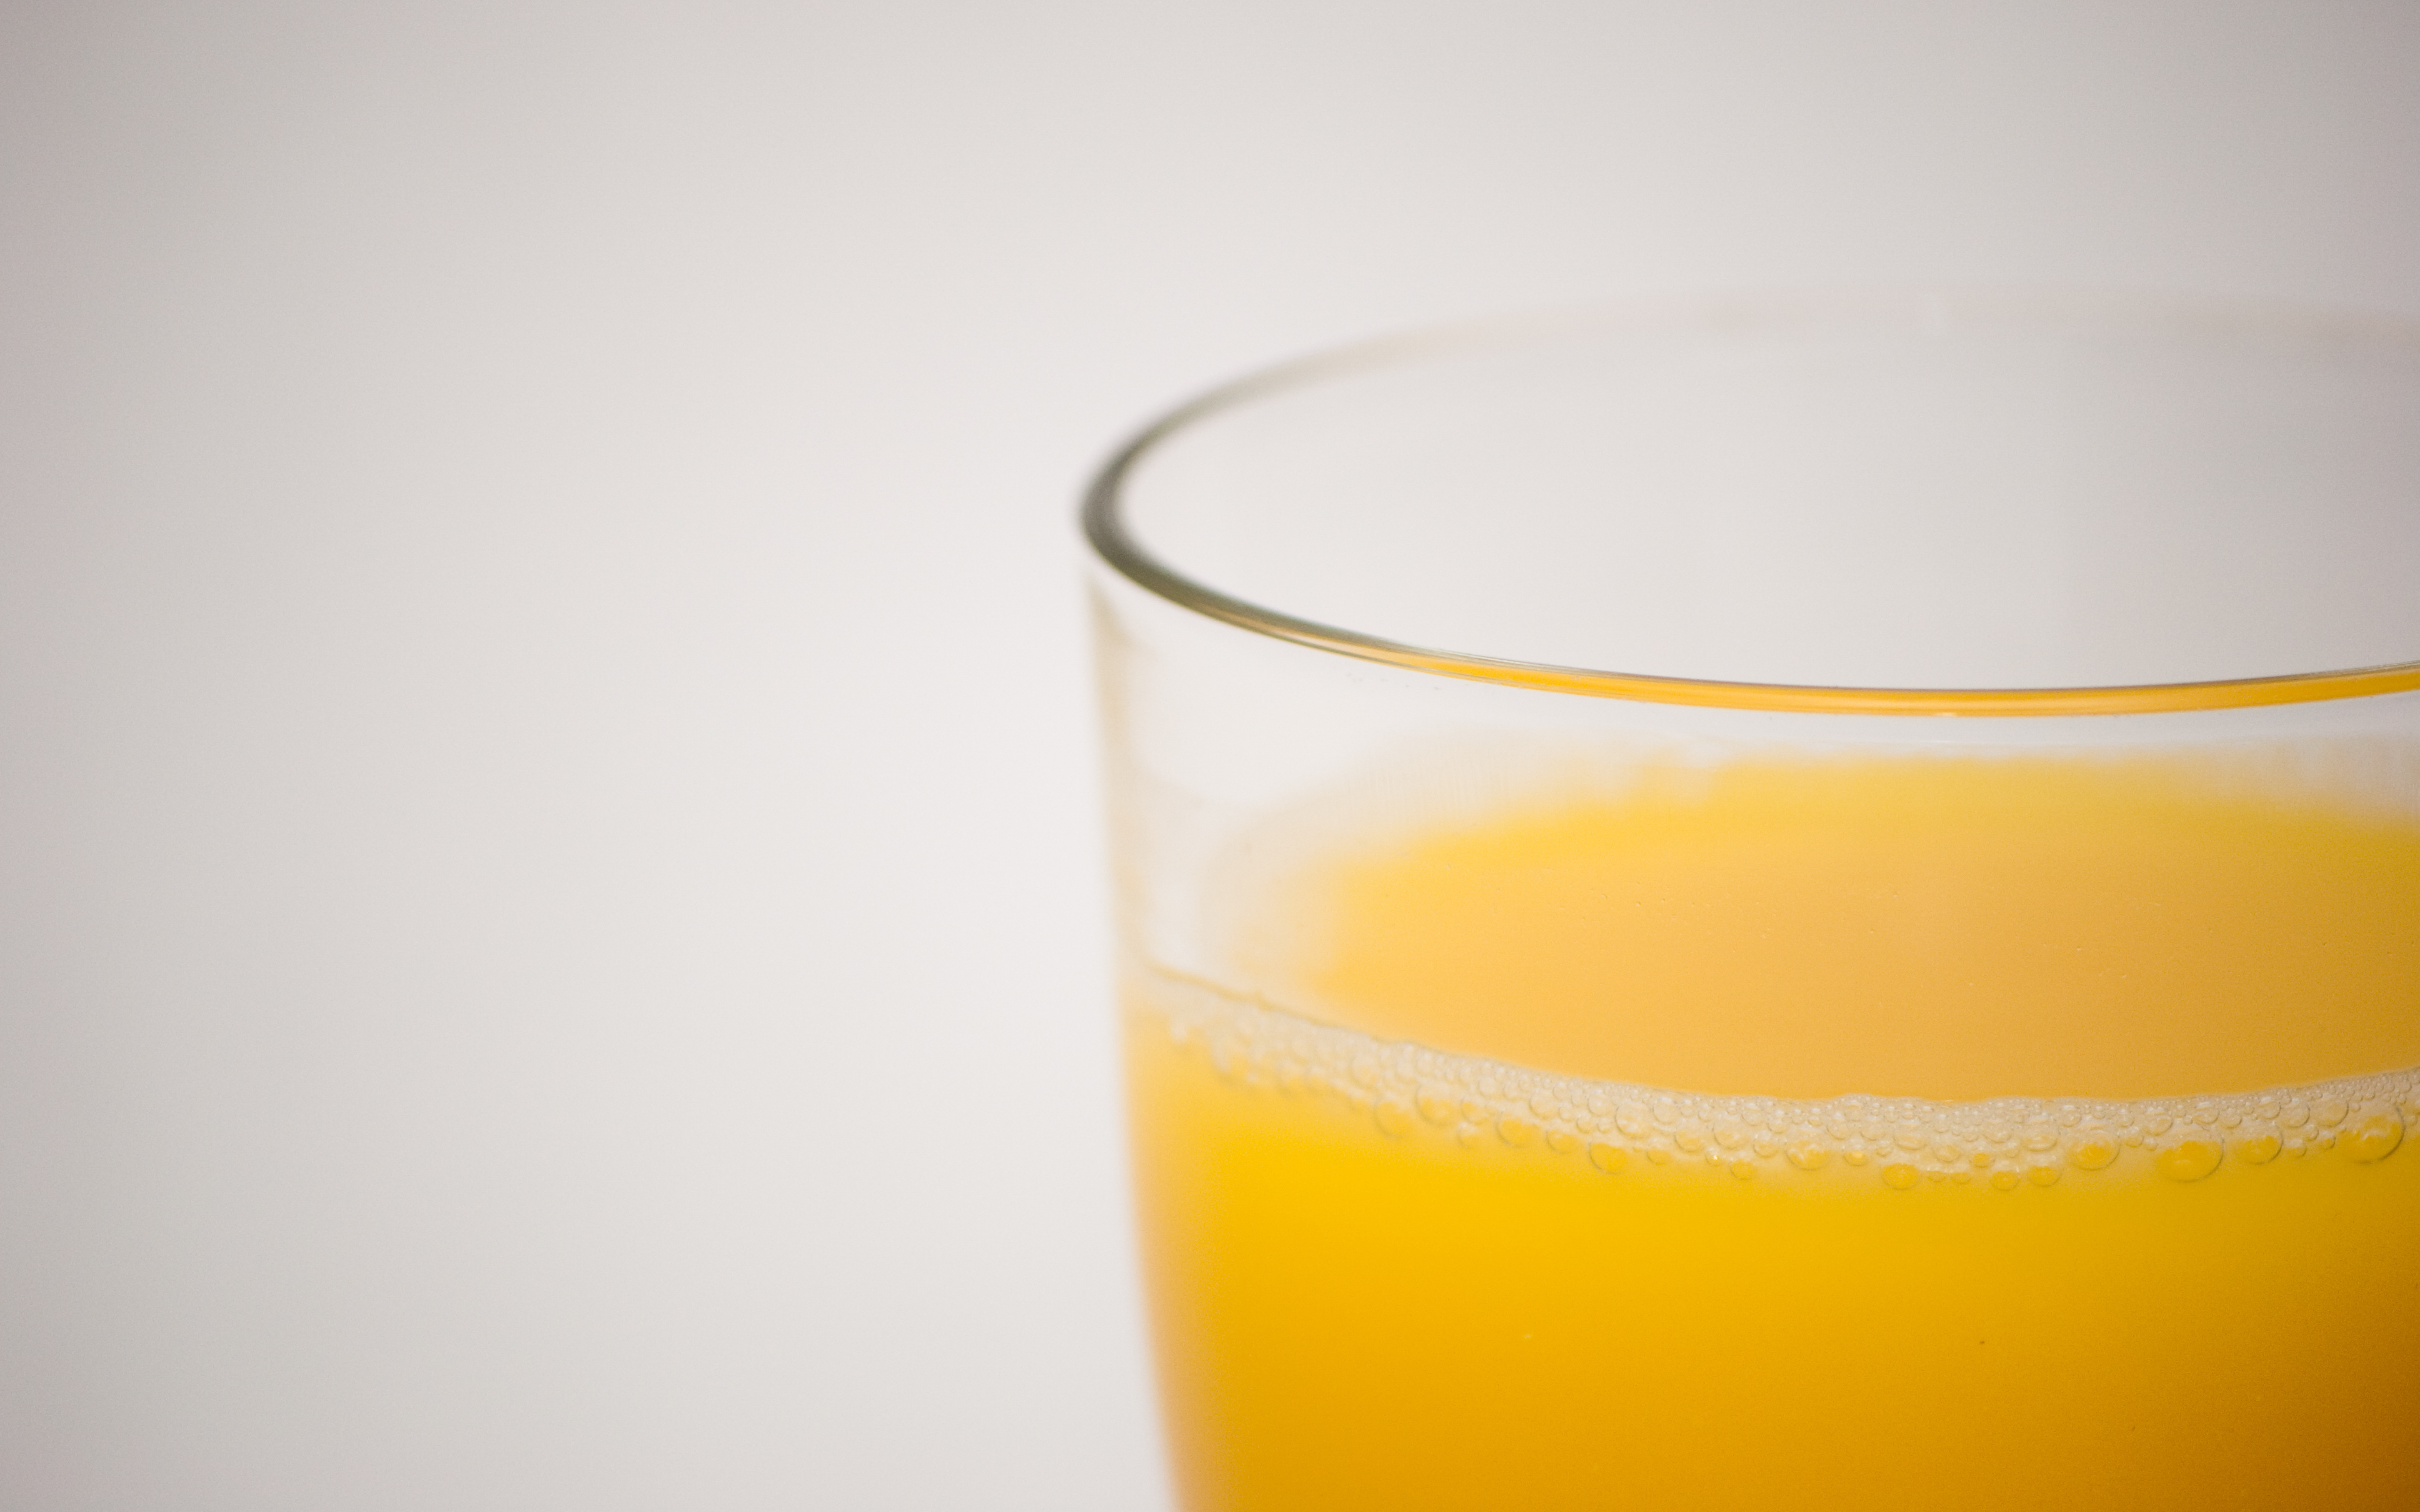 7 Hd Orange Juice Wallpapers